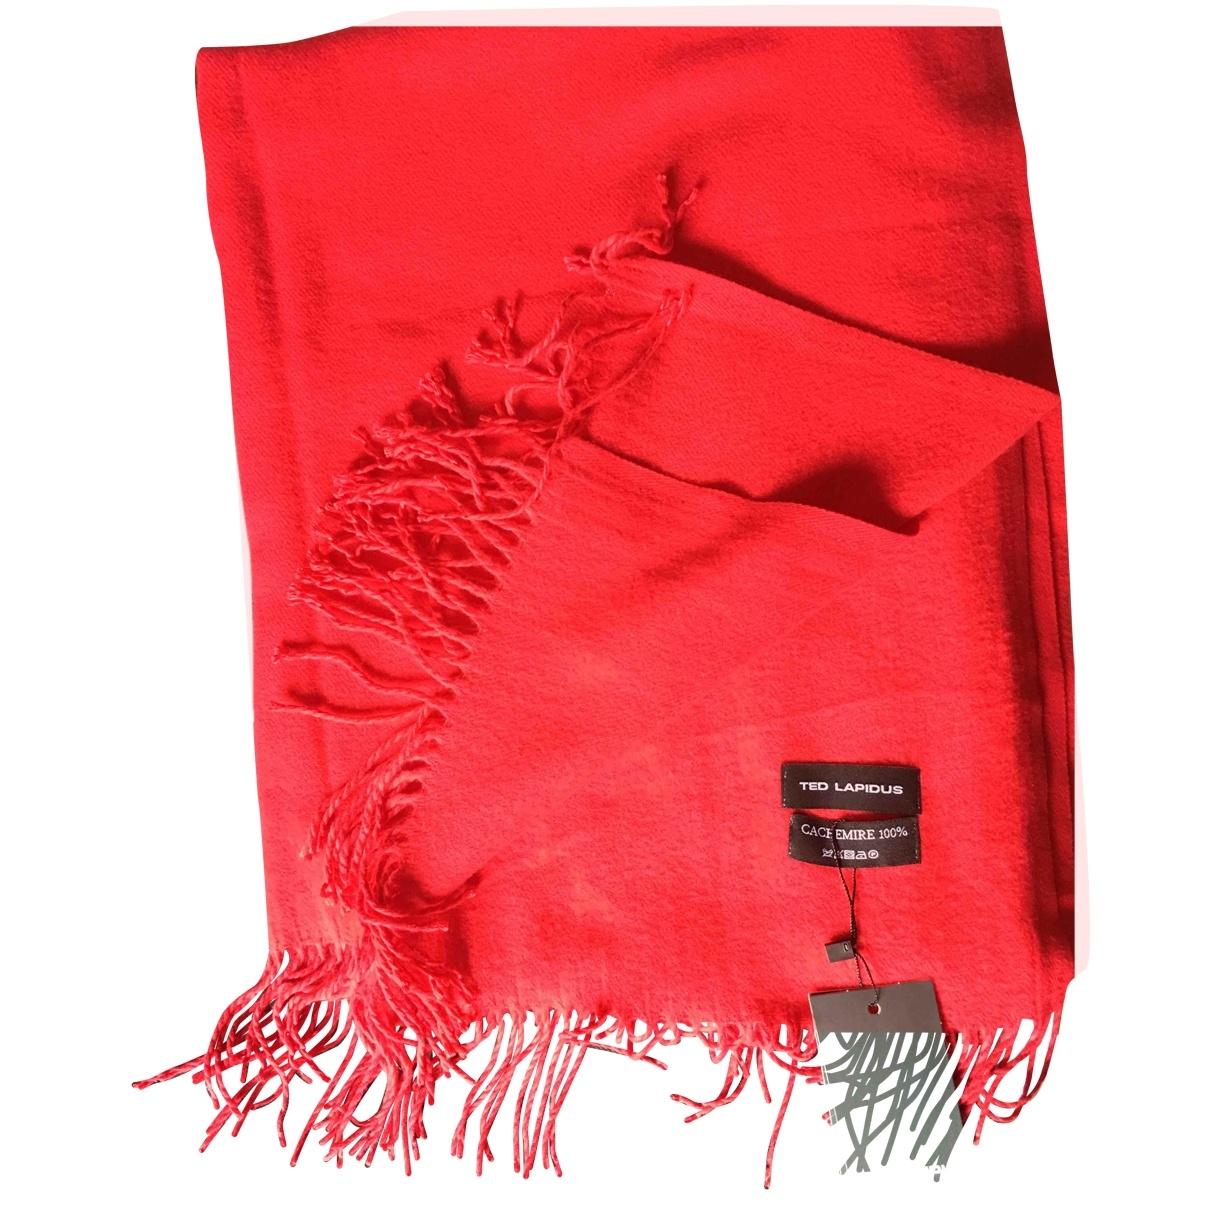 Pañuelo / bufanda de Cachemira Ted Lapidus